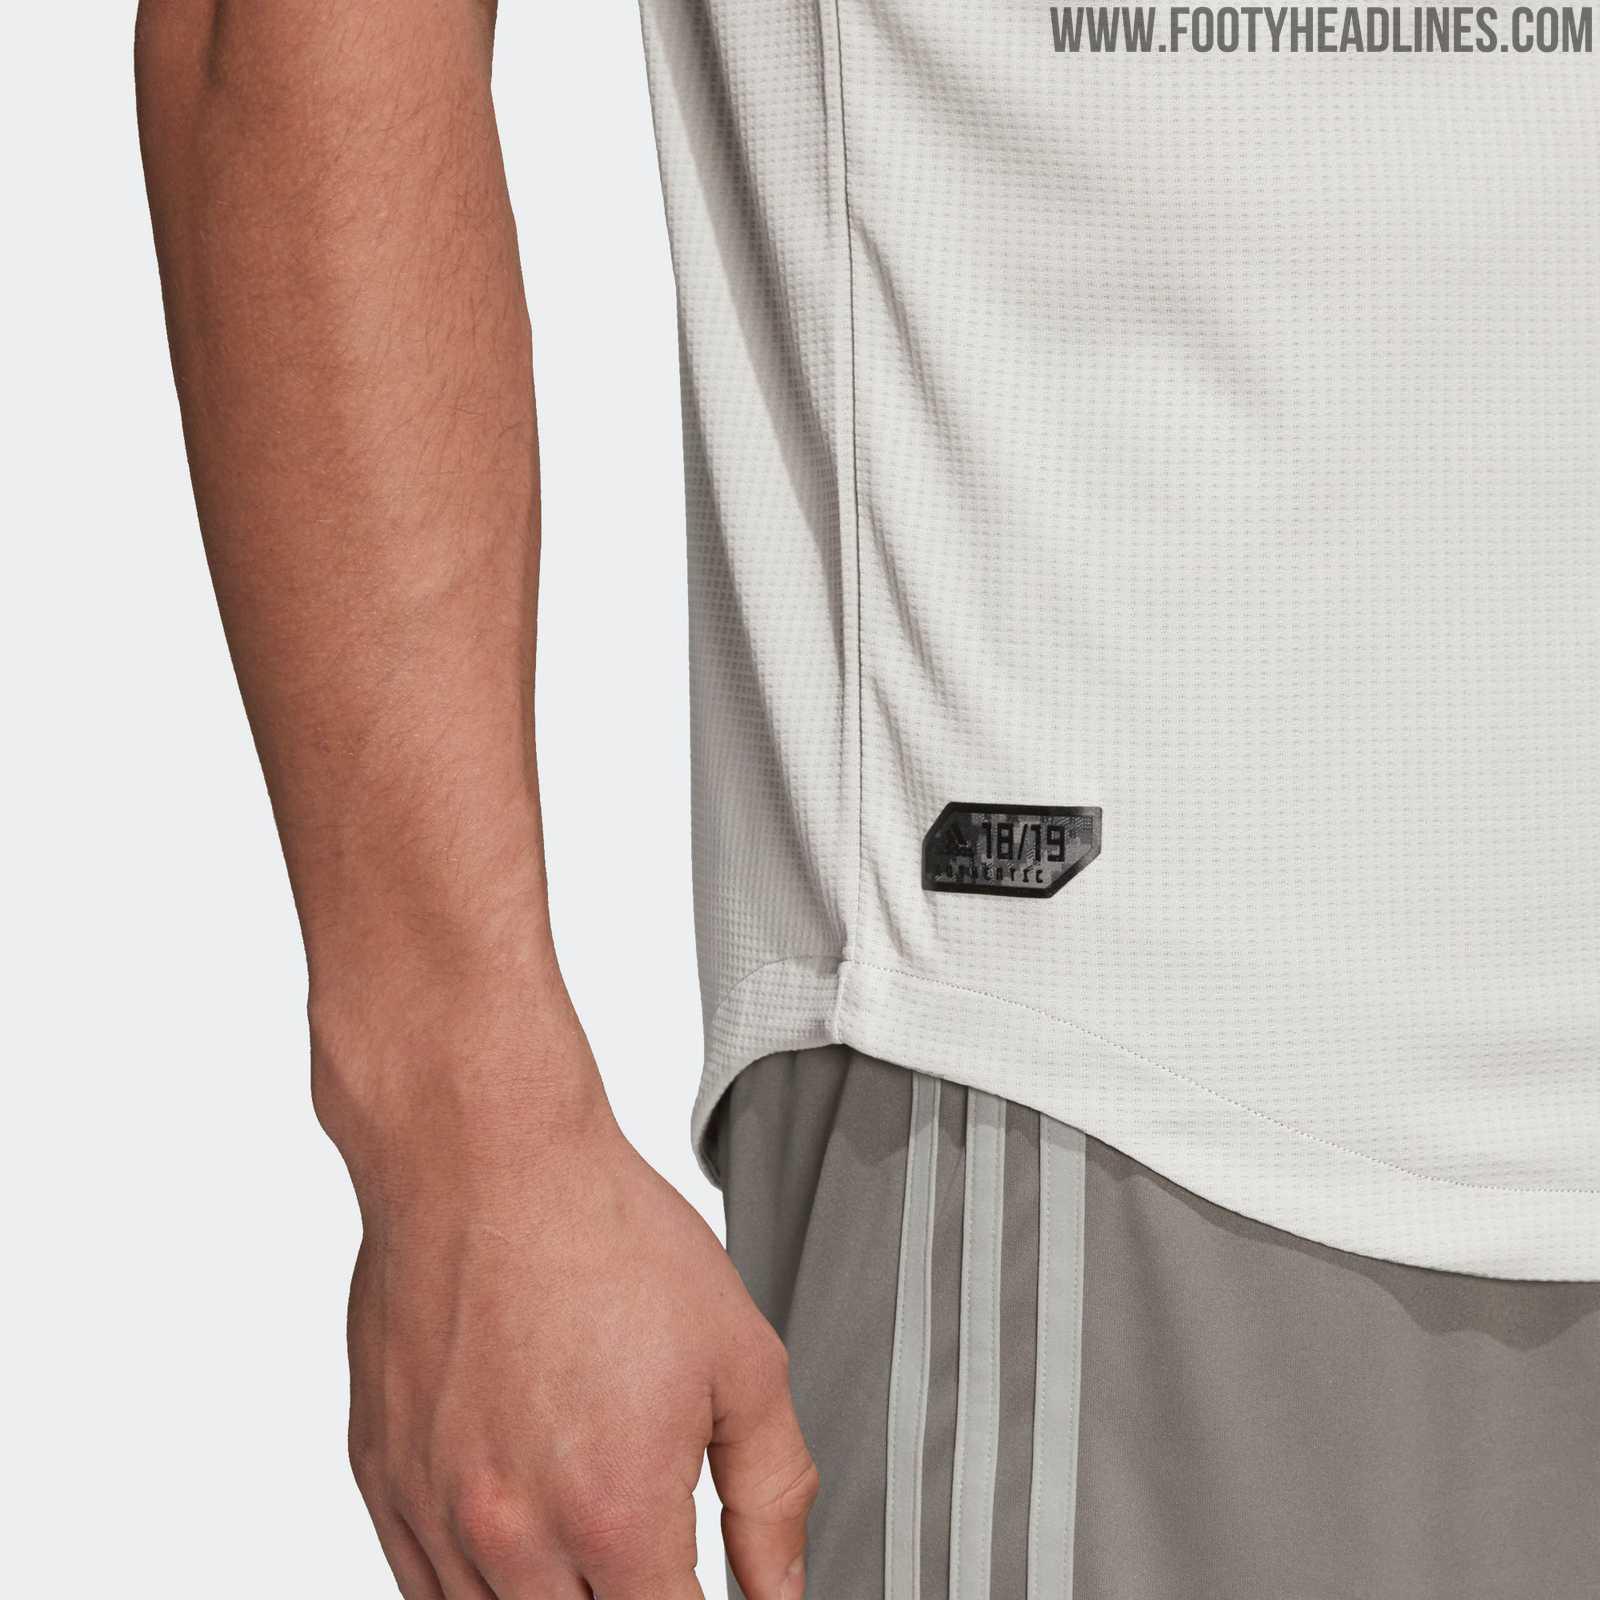 fe3aaba0c7f Juventus 18-19 Away Kit Released